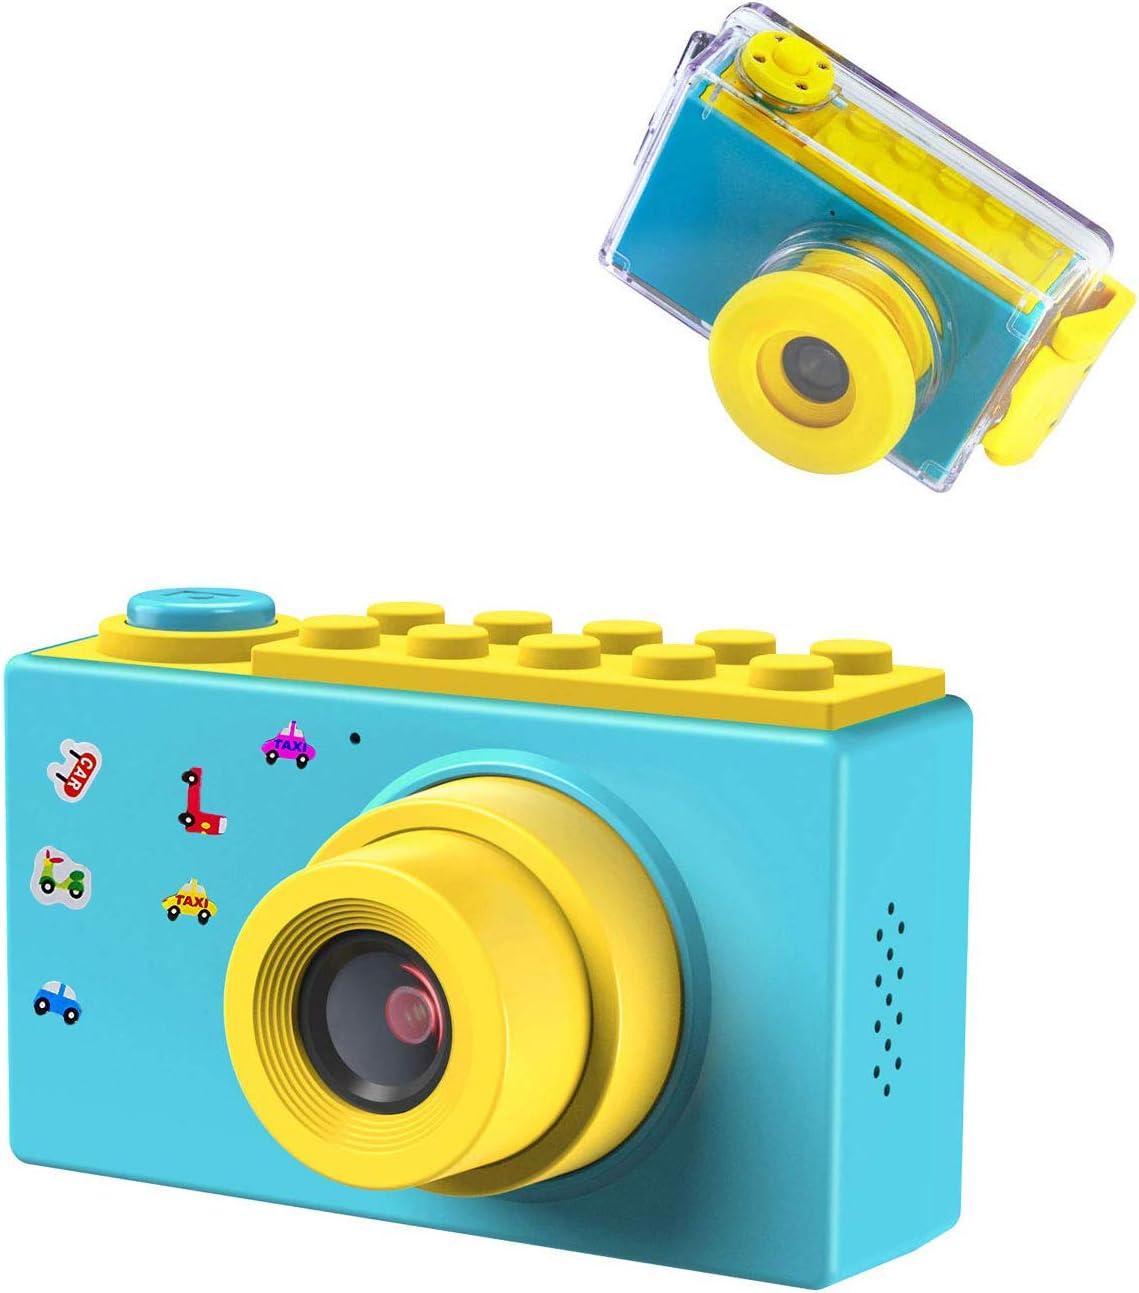 ShinePick Impermeable Cámara Fotos Niños, Zoom Digital de 4X / 8MP / 1080P HD / 2